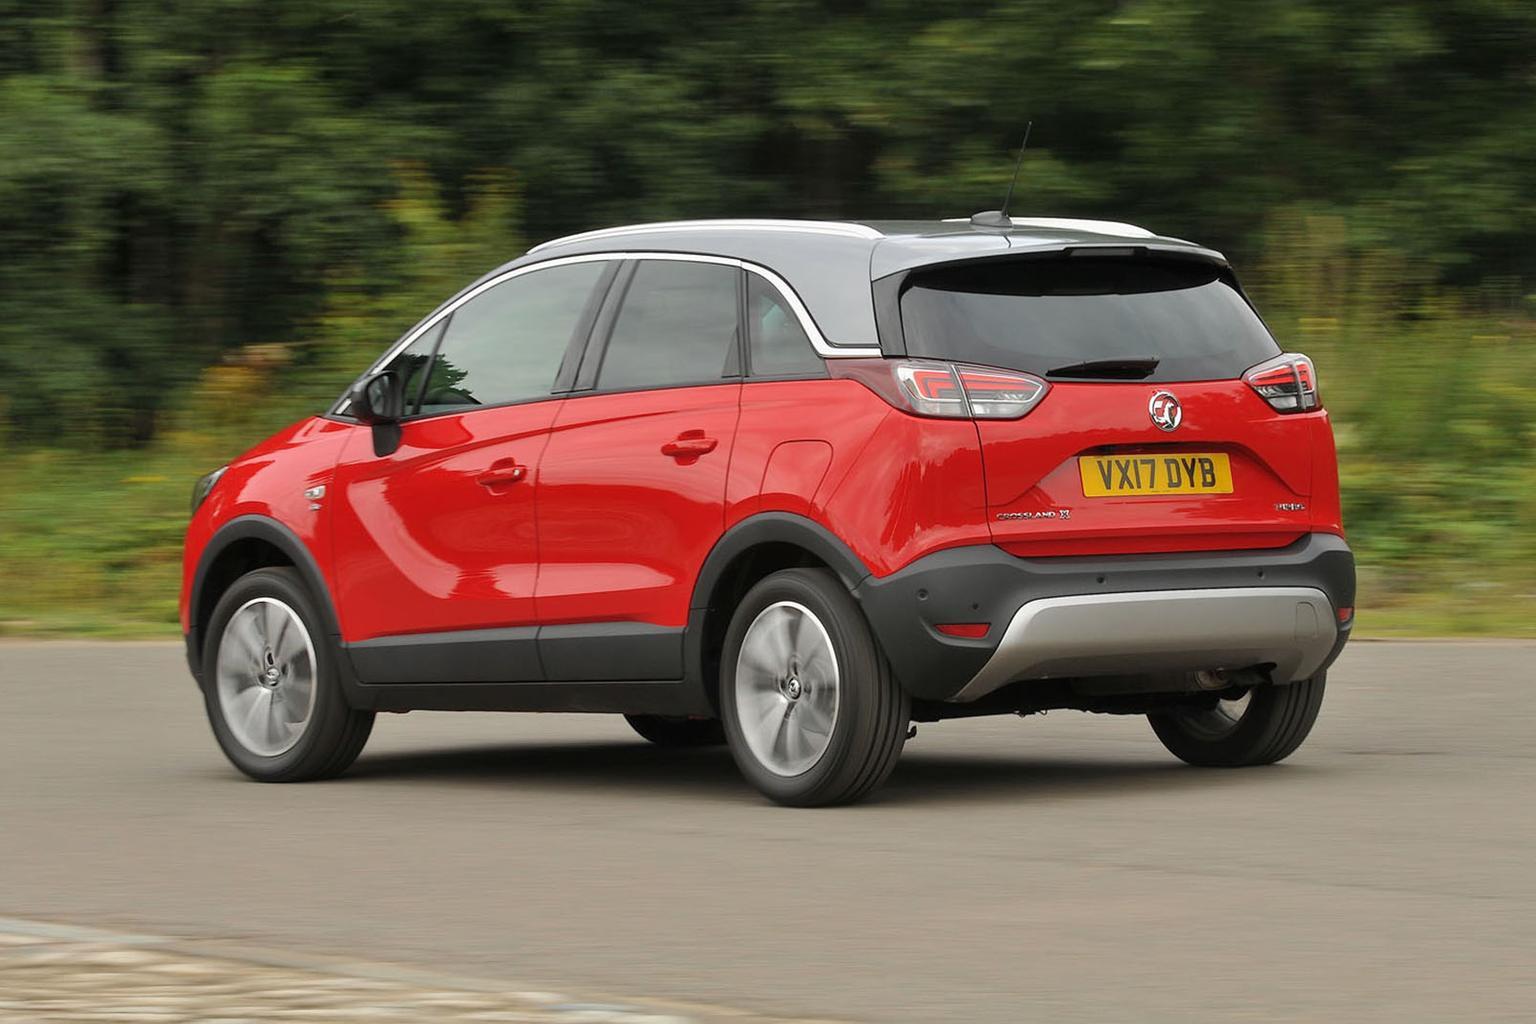 New Vauxhall Crossland X & Renault Captur vs Suzuki Vitara